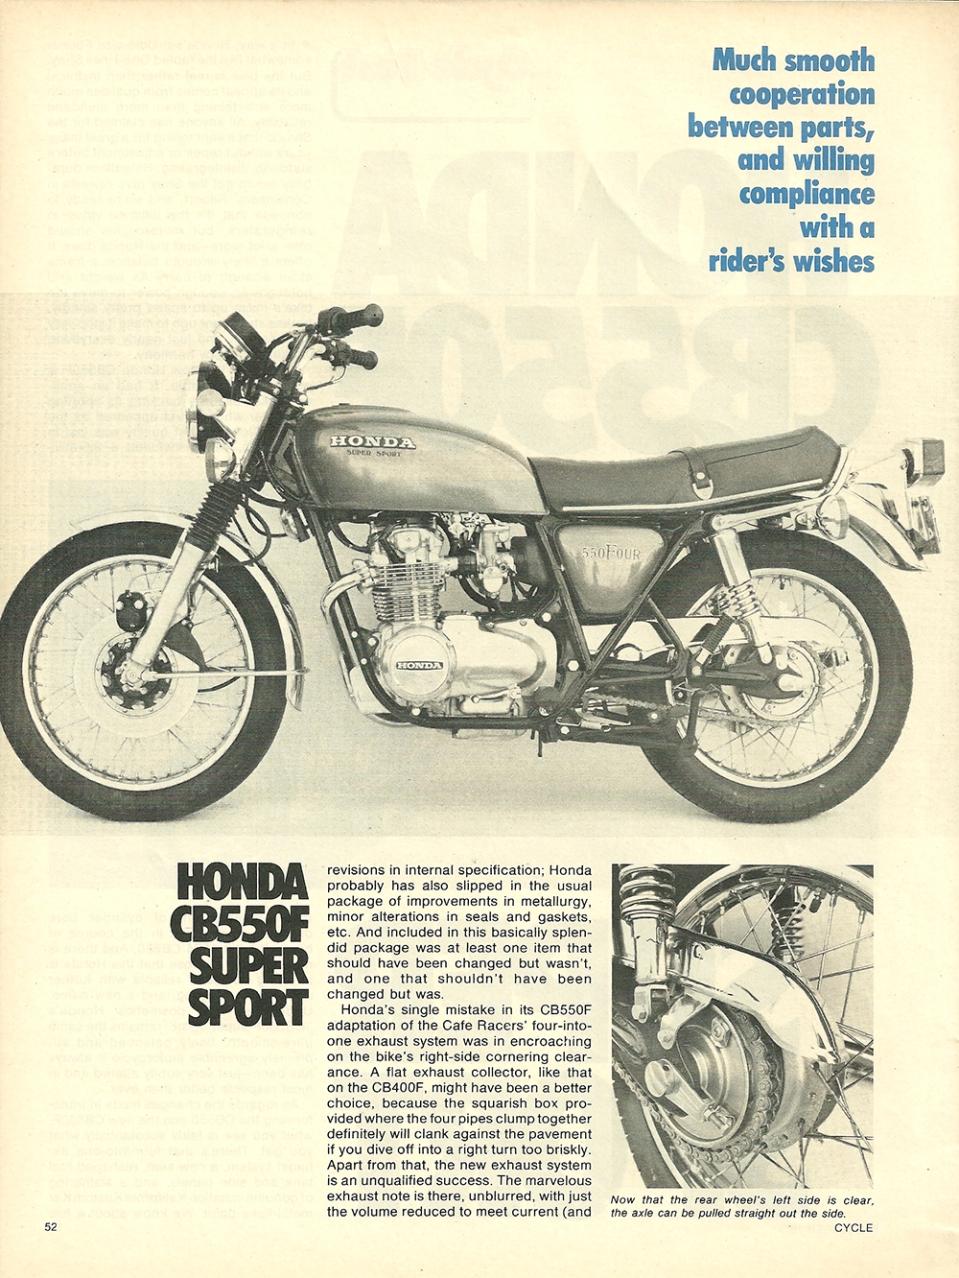 cycle-test-1975-honda-cb550f-super-sport-2